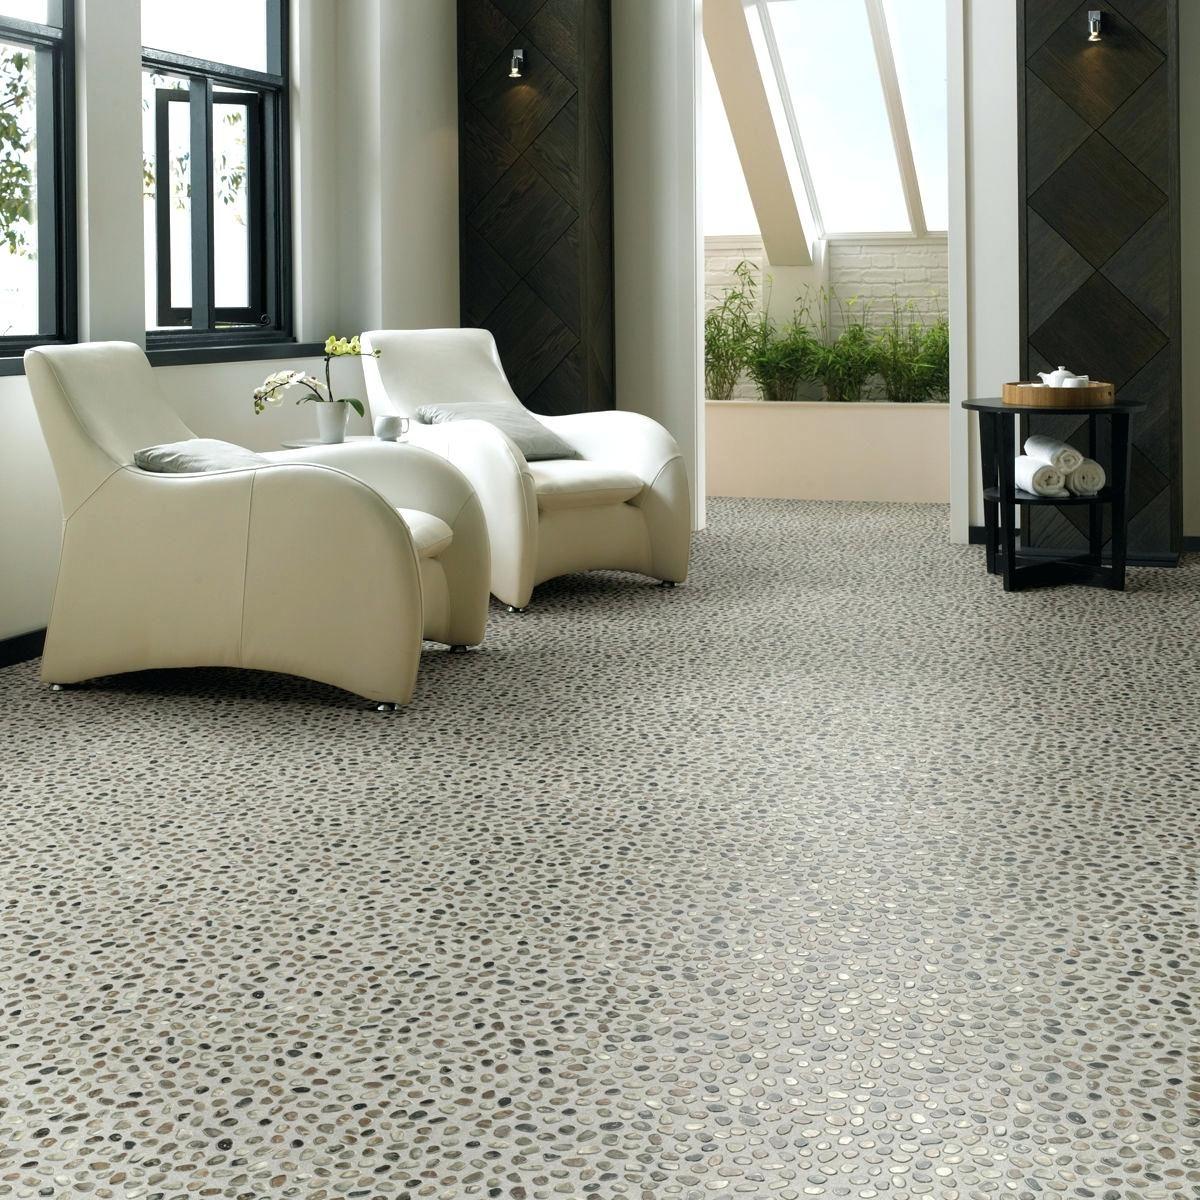 Mid Century Vinyl Floor Tiles Google Search Vinyl Flooring Vinyl Tile Flooring Luxury Vinyl Tile